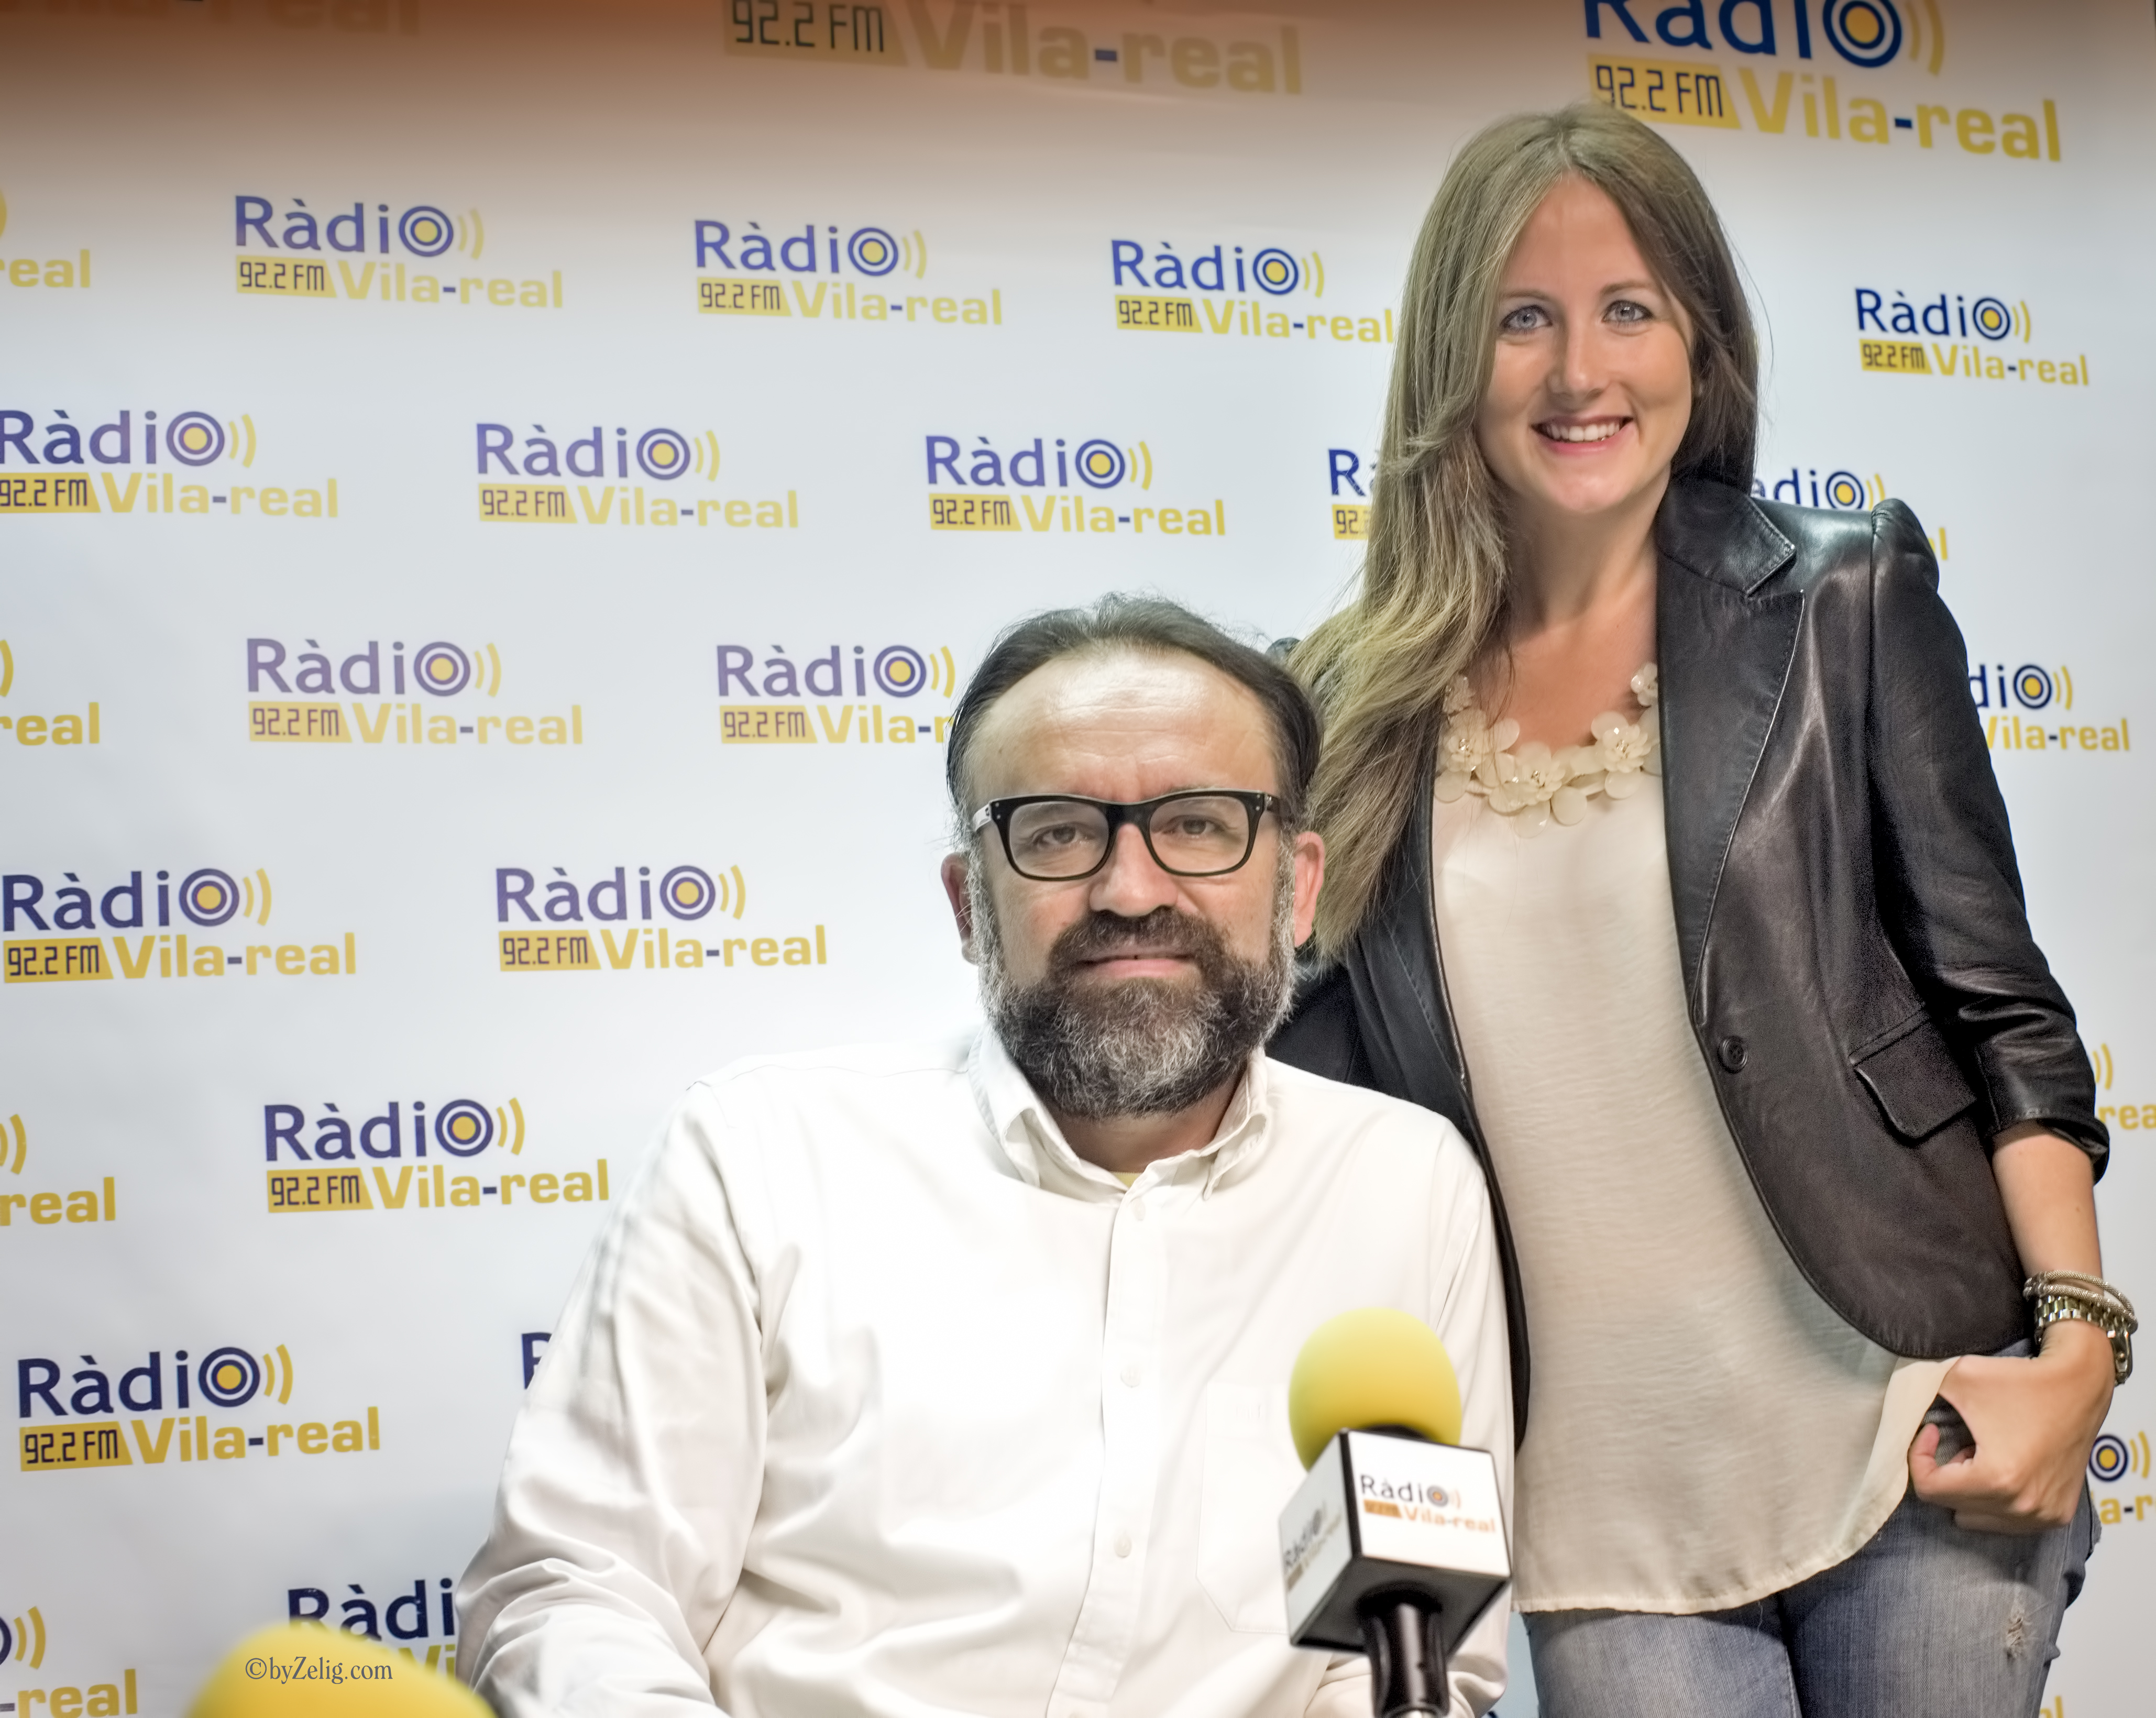 Esports Radio Vila-real. Programa del 18 de octubre 2017